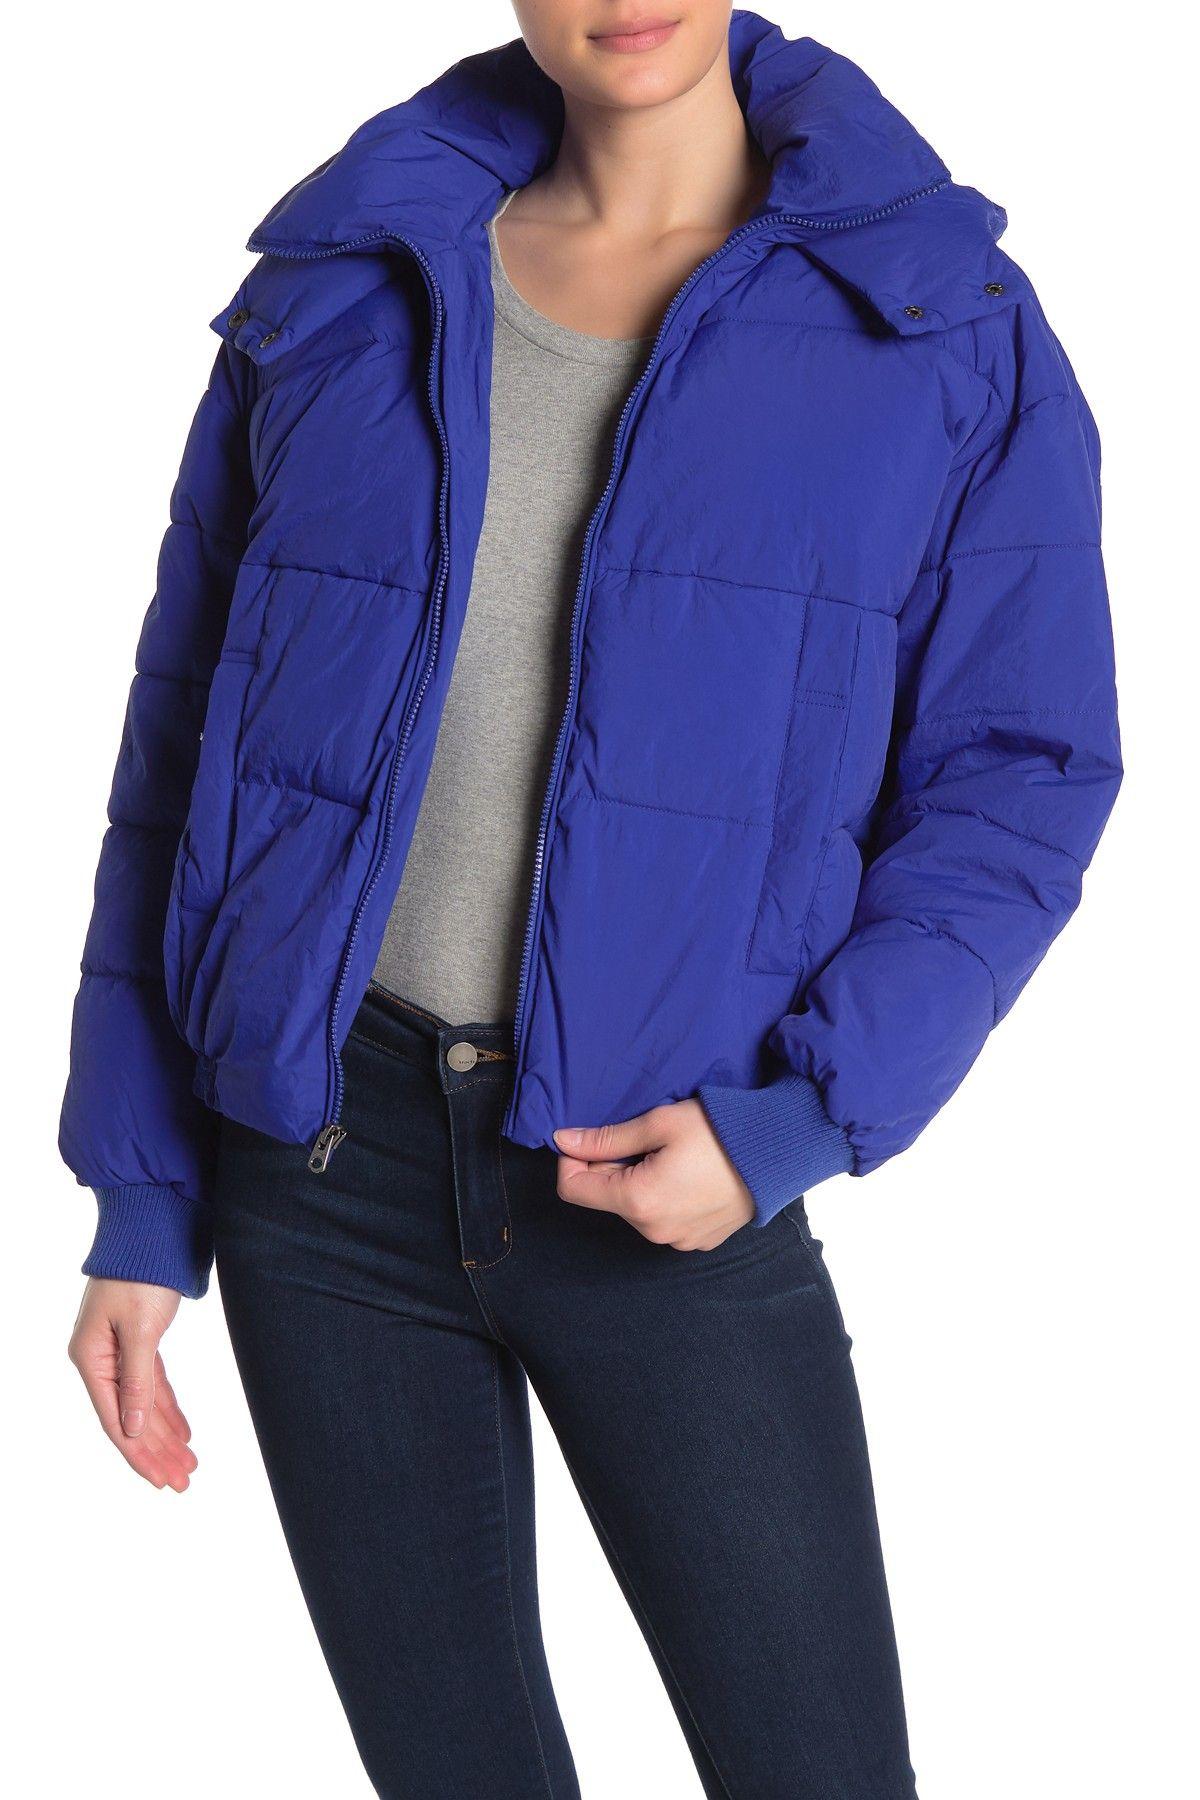 Lucky Brand Missy Short Puffer Jacket Nordstrom Rack Short Puffer Jacket Blue Puffer Jacket Puffer Jackets [ 1800 x 1200 Pixel ]